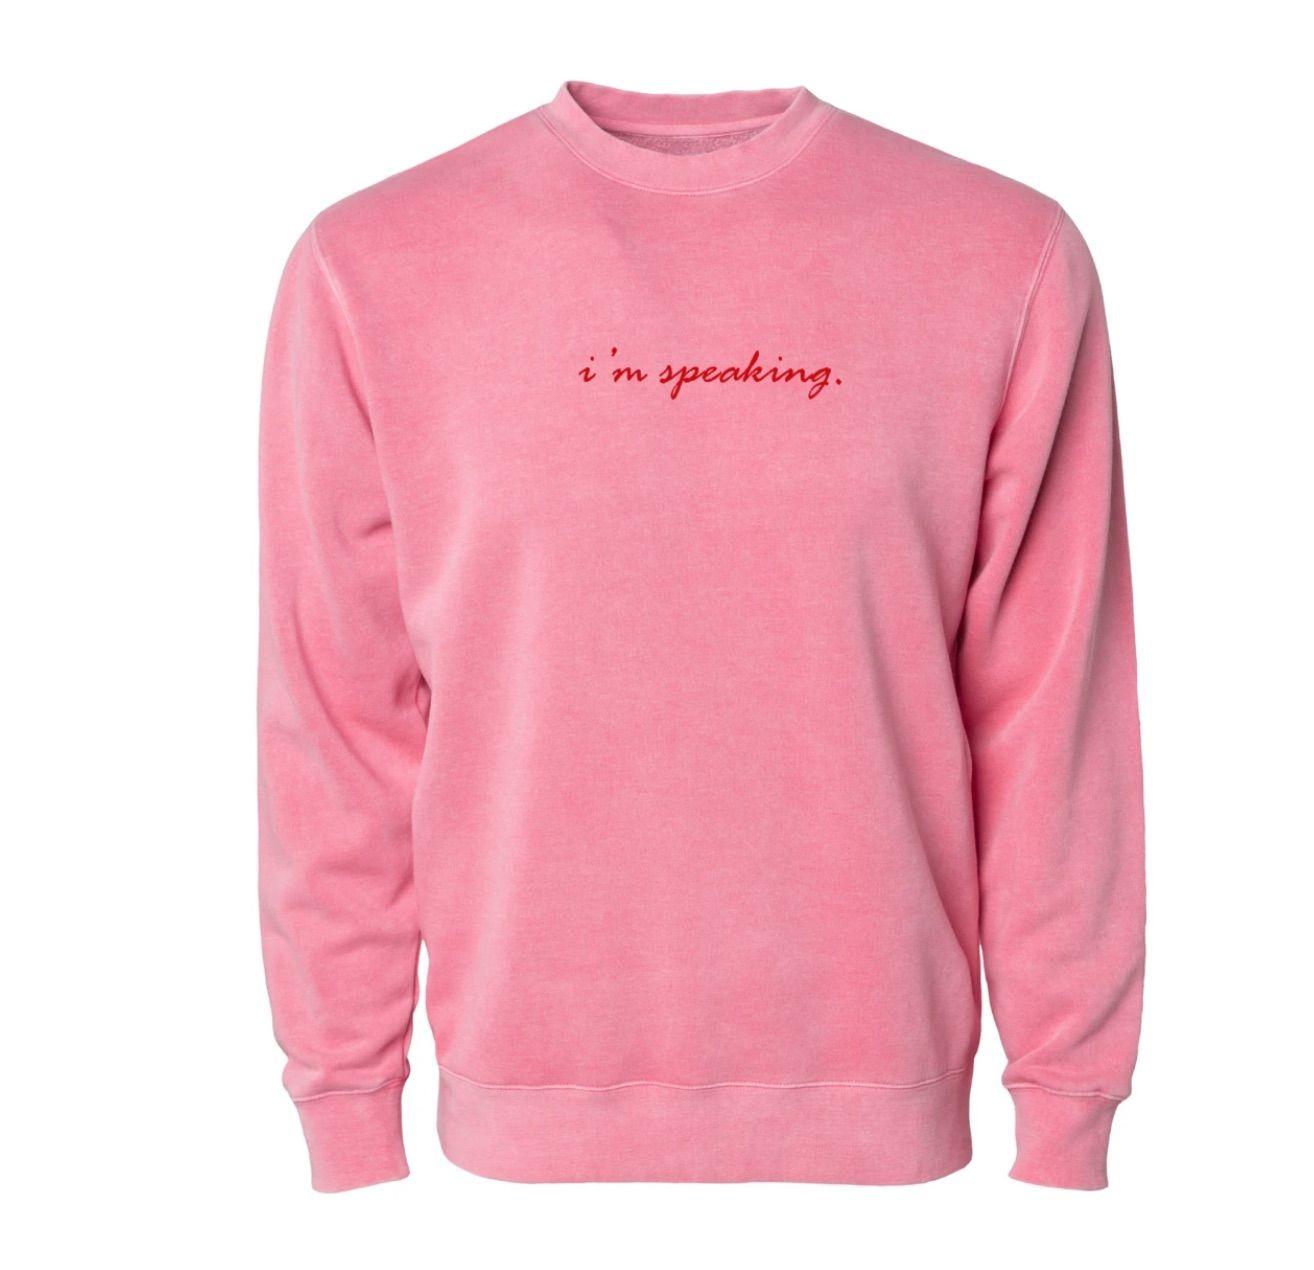 2020 Gifts The Very Appropriate For 2020 Gift Guide Jess Ann Kirby Sweatshirts Crew Neck Sweatshirt Pink Sweatshirt [ 1270 x 1314 Pixel ]